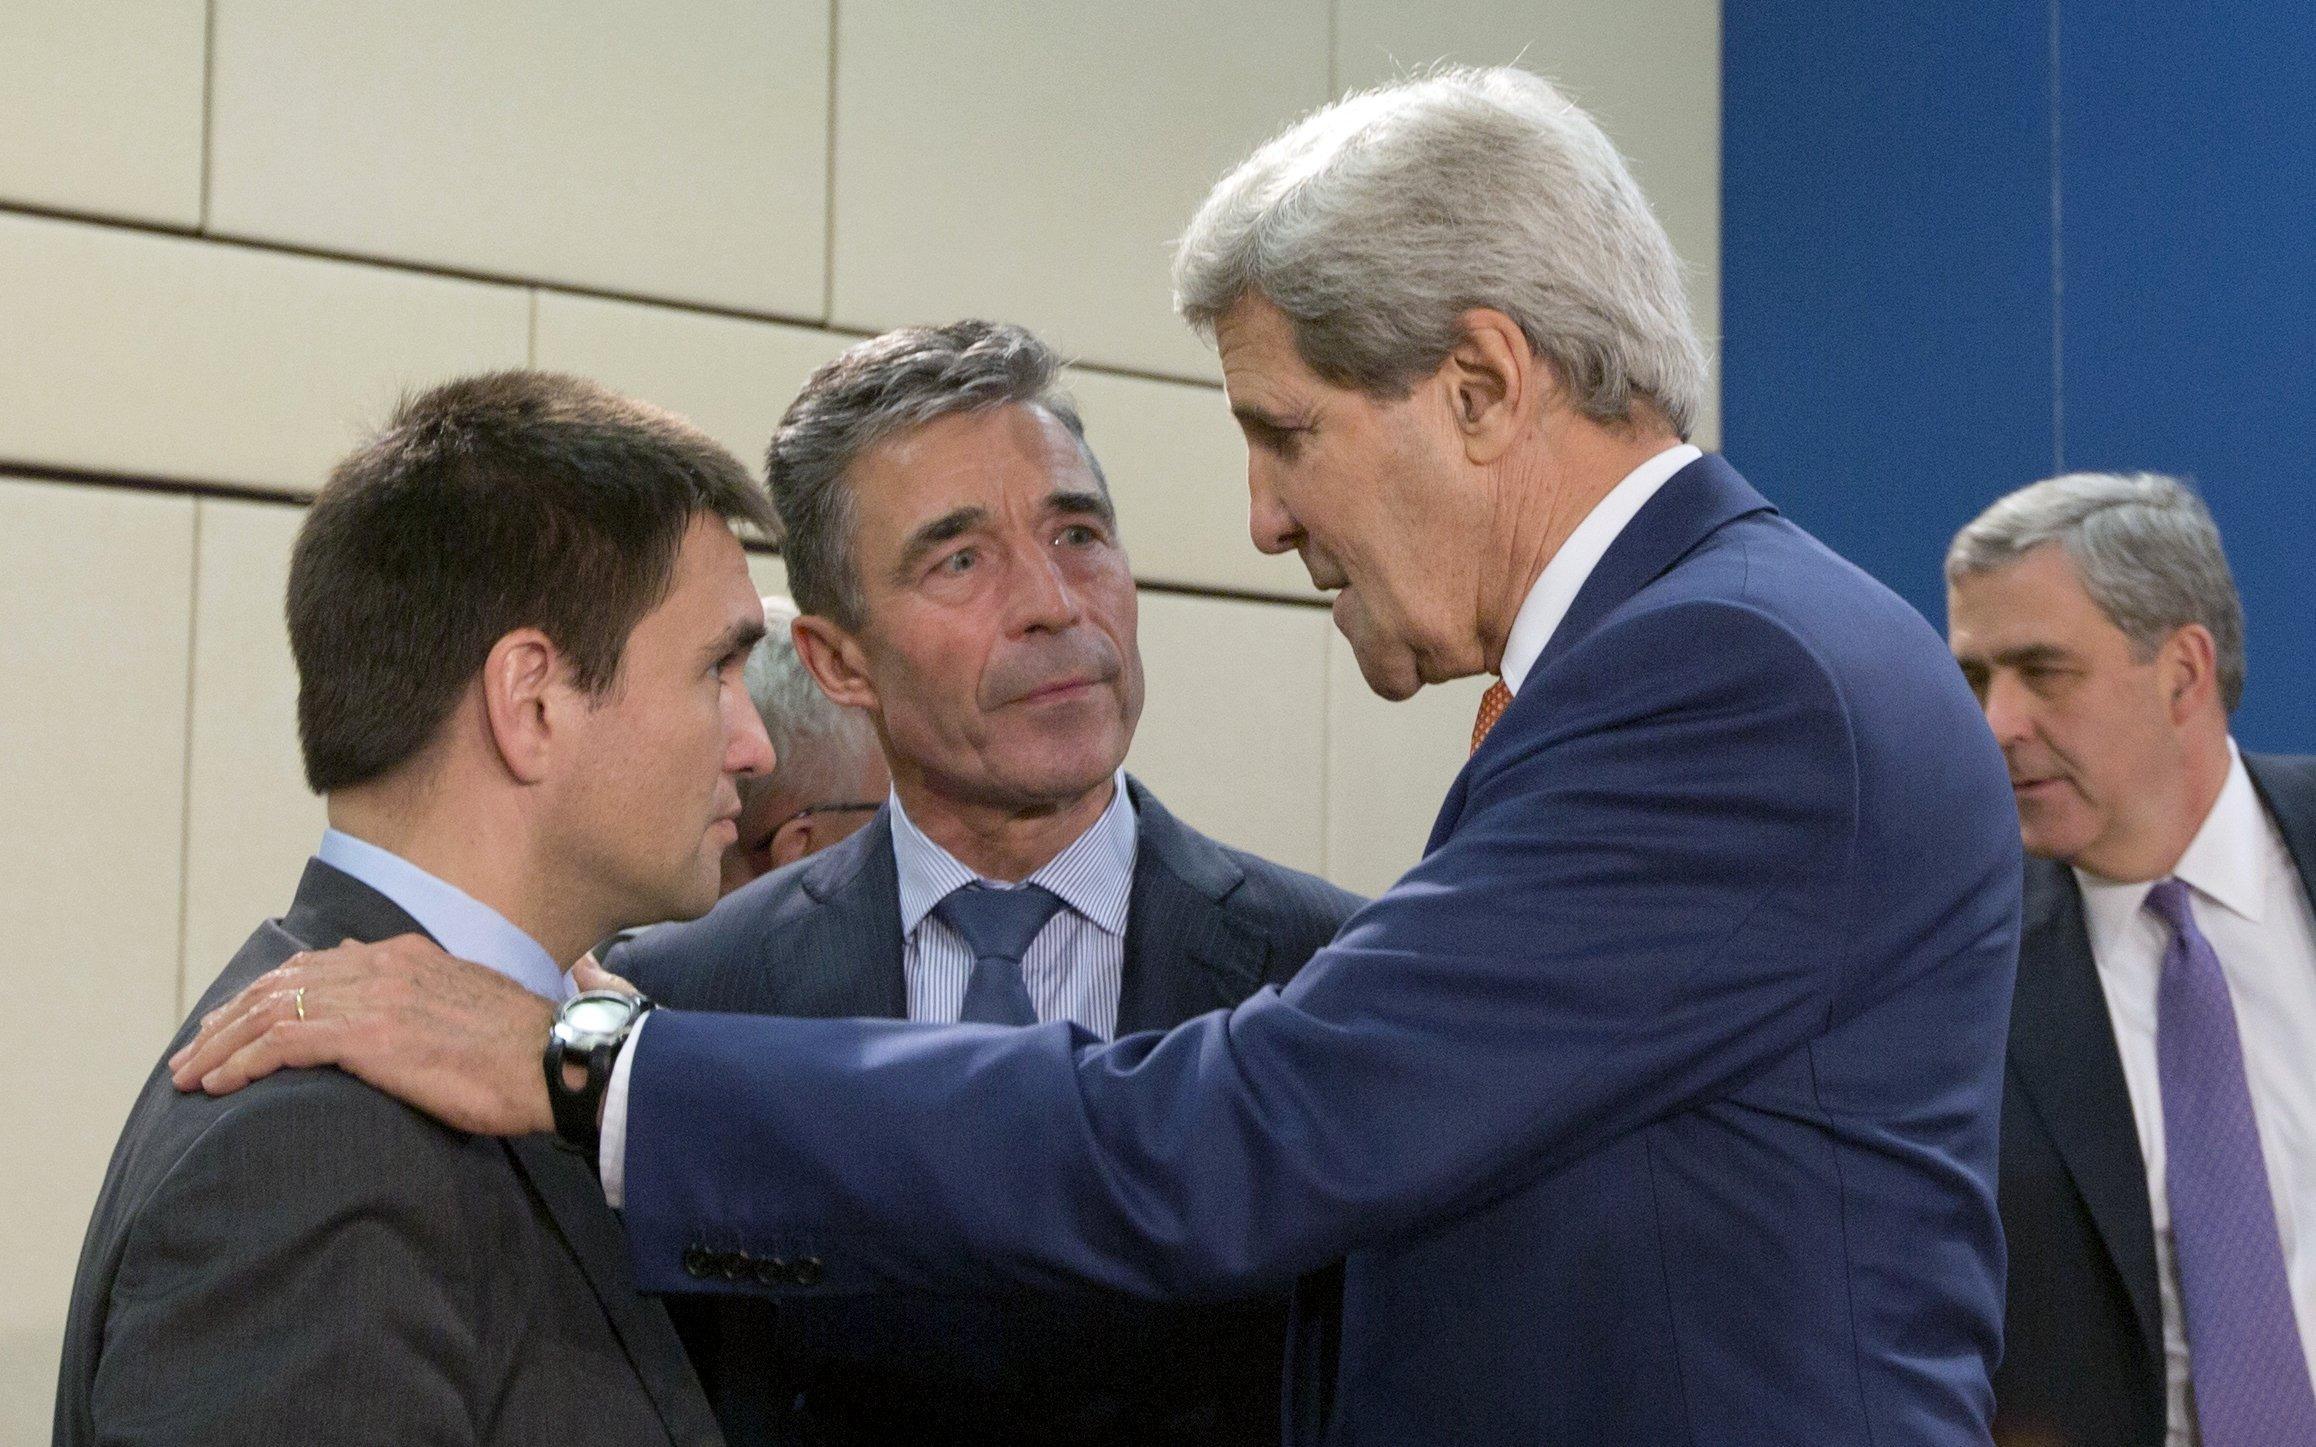 Image: Pavlo Klimkin, John Kerry, Anders Fogh Rasmussen